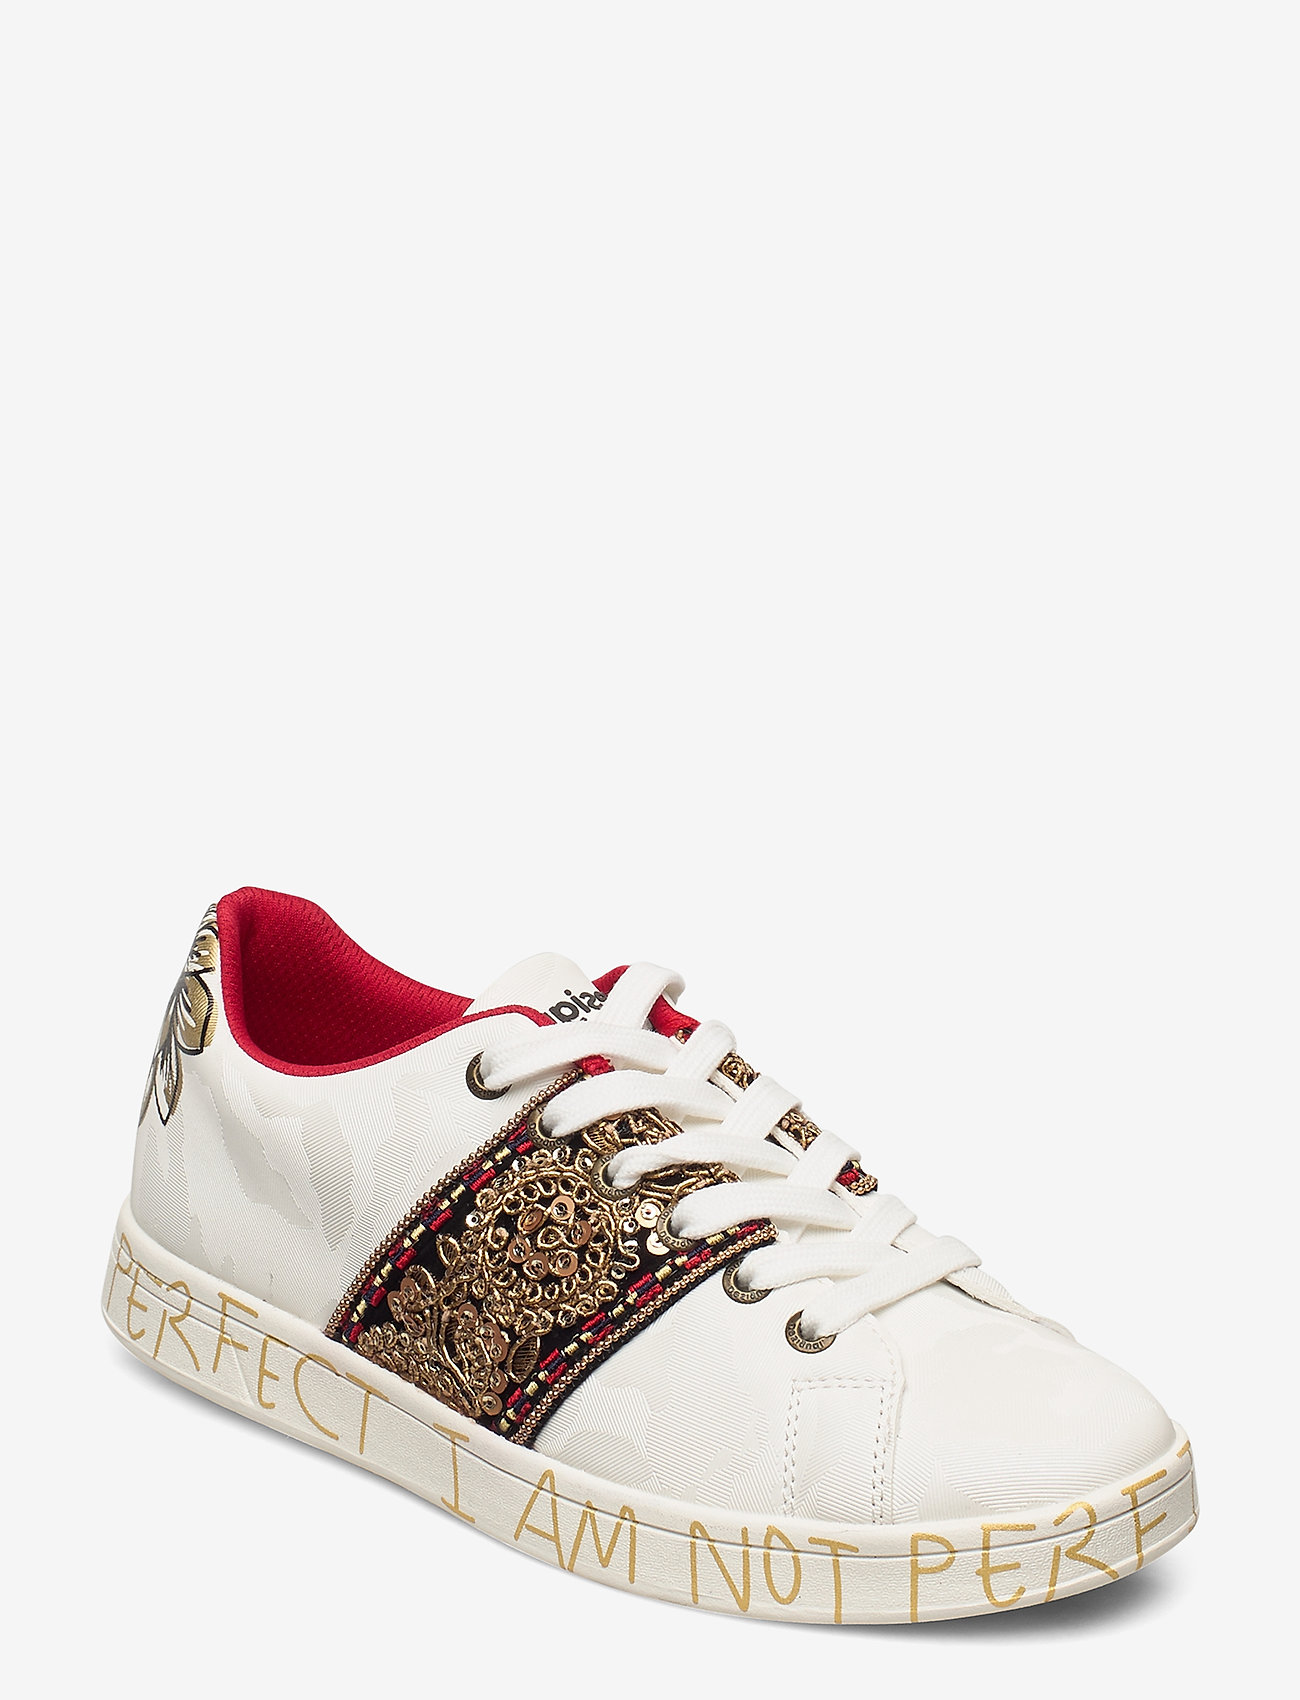 Desigual Shoes - SHOES COSMIC INDIA - låga sneakers - blanco - 0